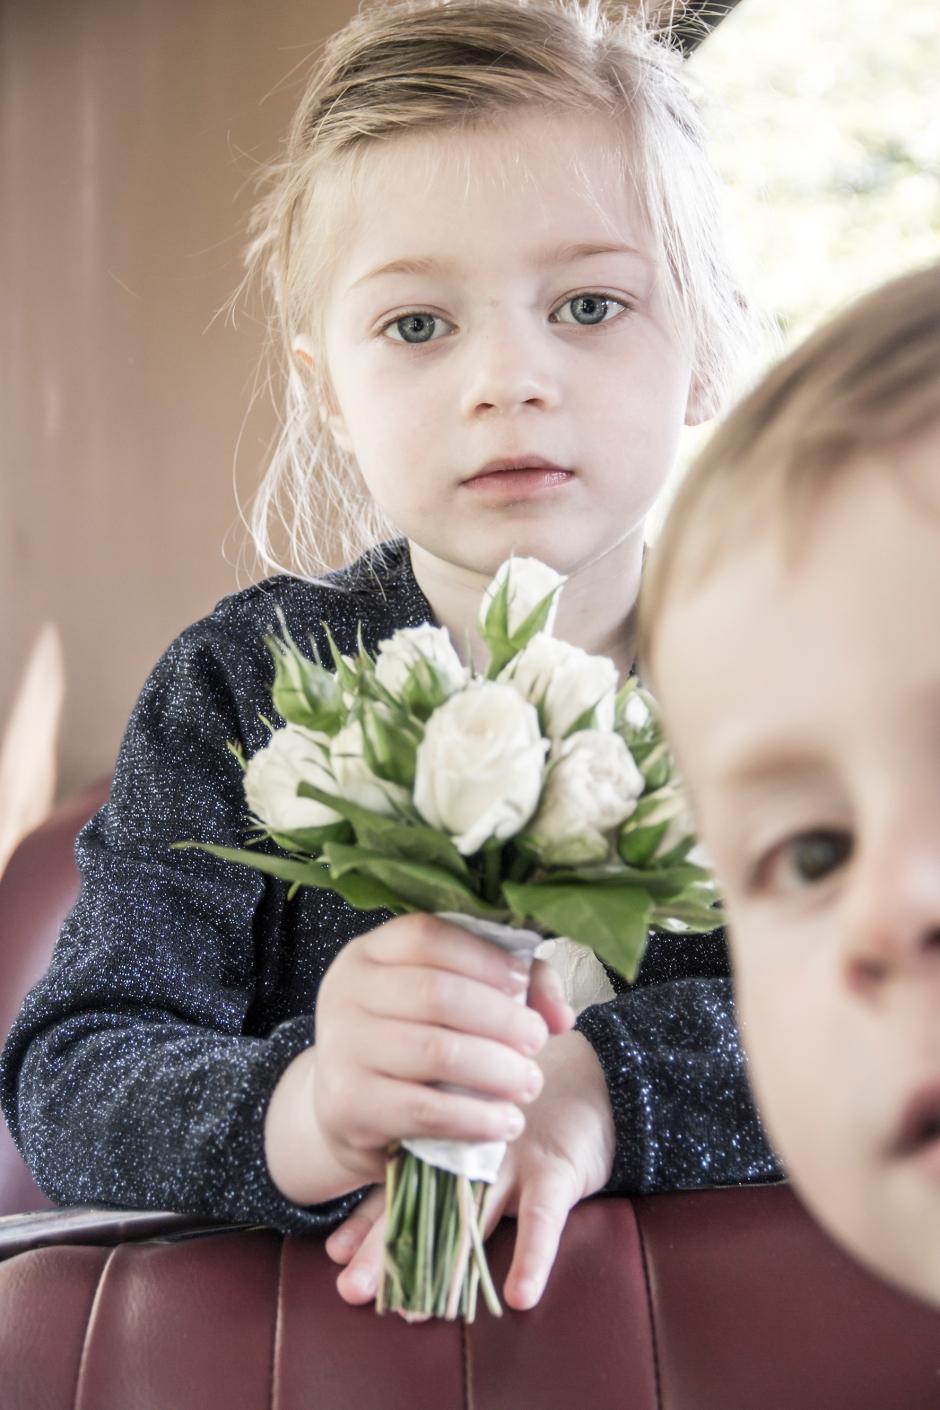 Elsbeth_Neyens_wedding_children.jpg